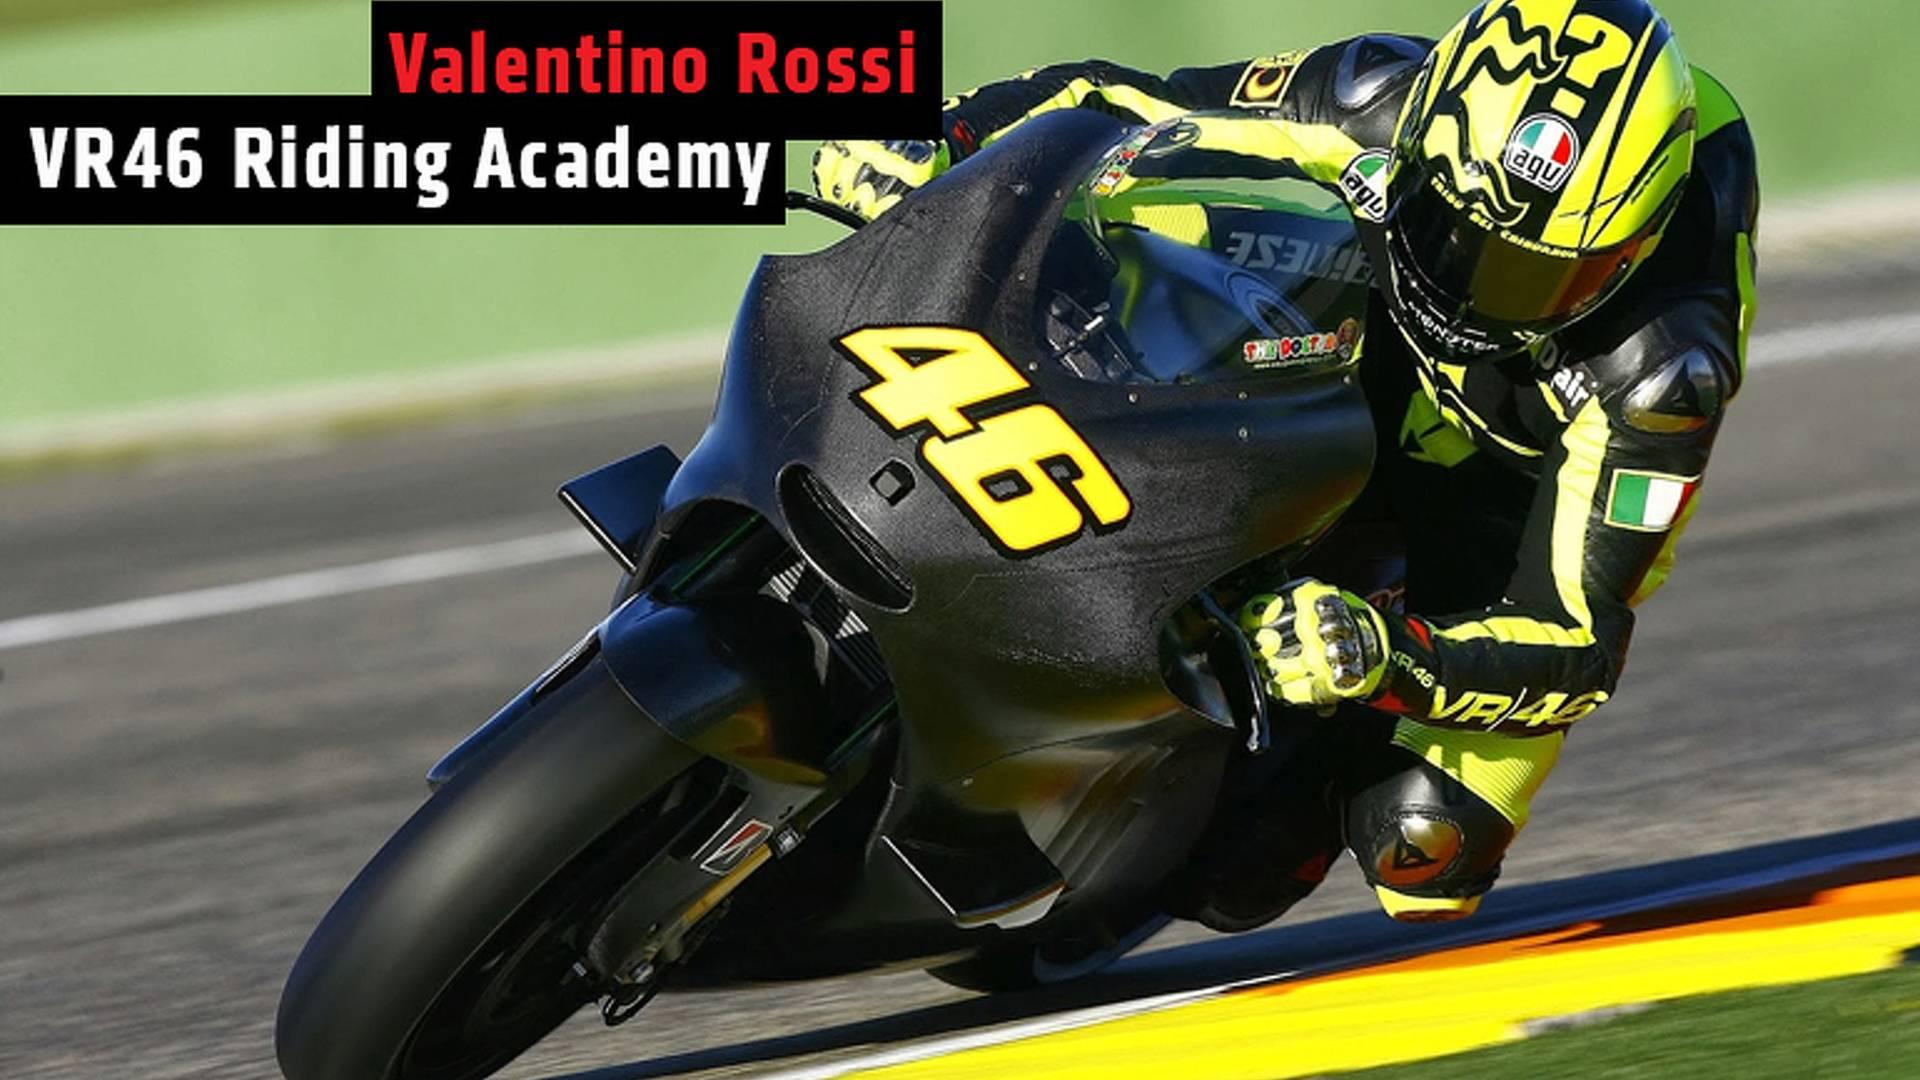 valentino-rossi-vr46-riding-academy.jpg